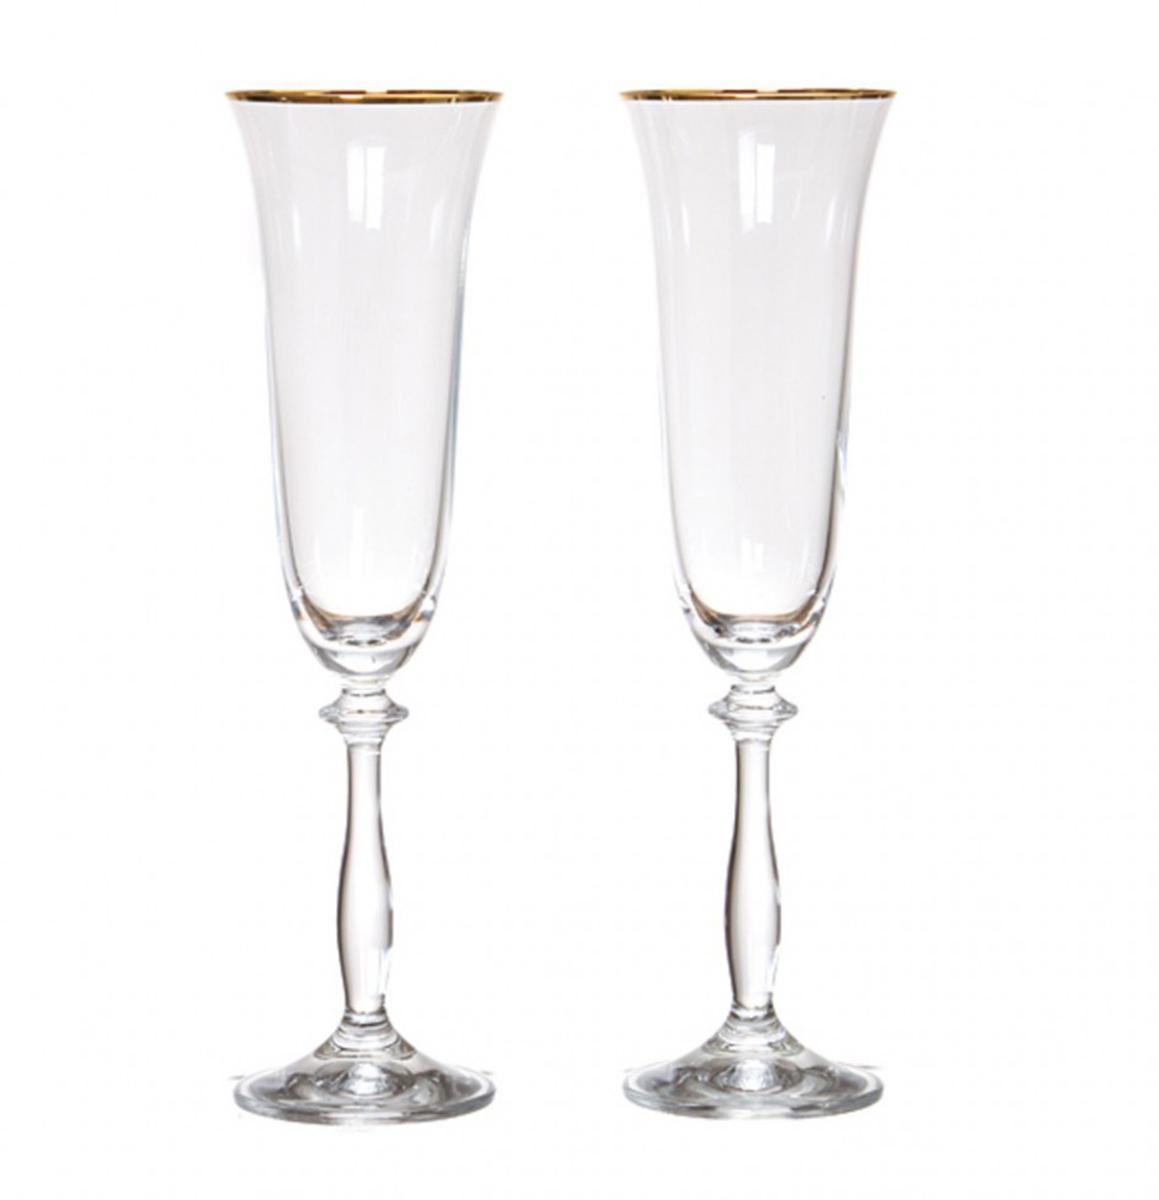 Набор бокалов для шампанского Bohemia Crystal Анжела, 190 мл, 2 шт. 40600/20787/190/2 набор бокалов для шампанского bohemia crystal оливия 190 мл 6 шт